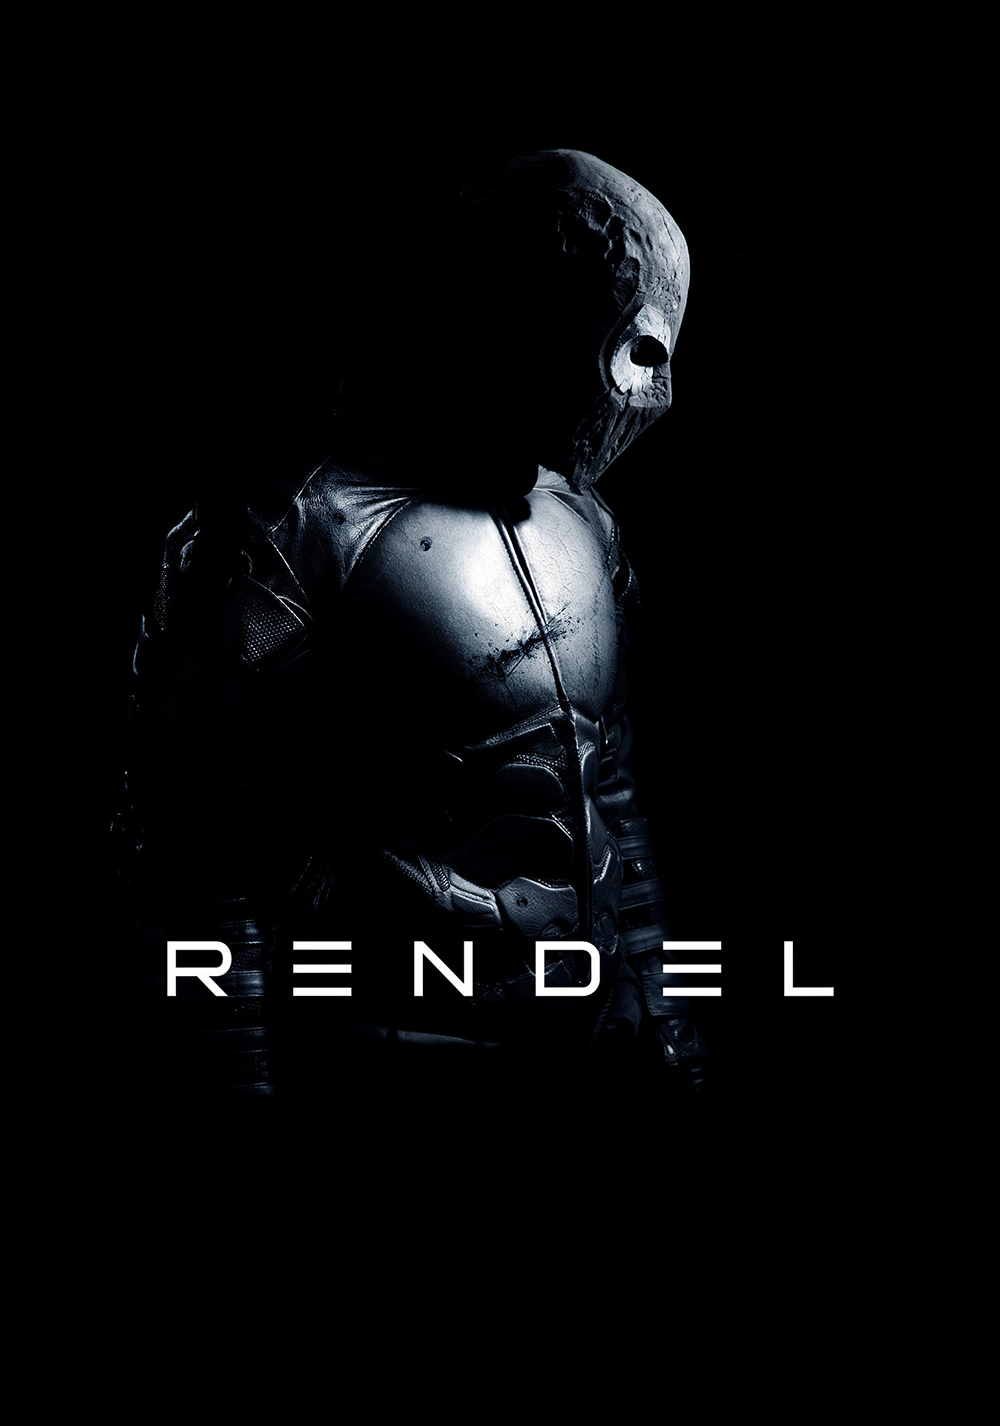 Rendel Film